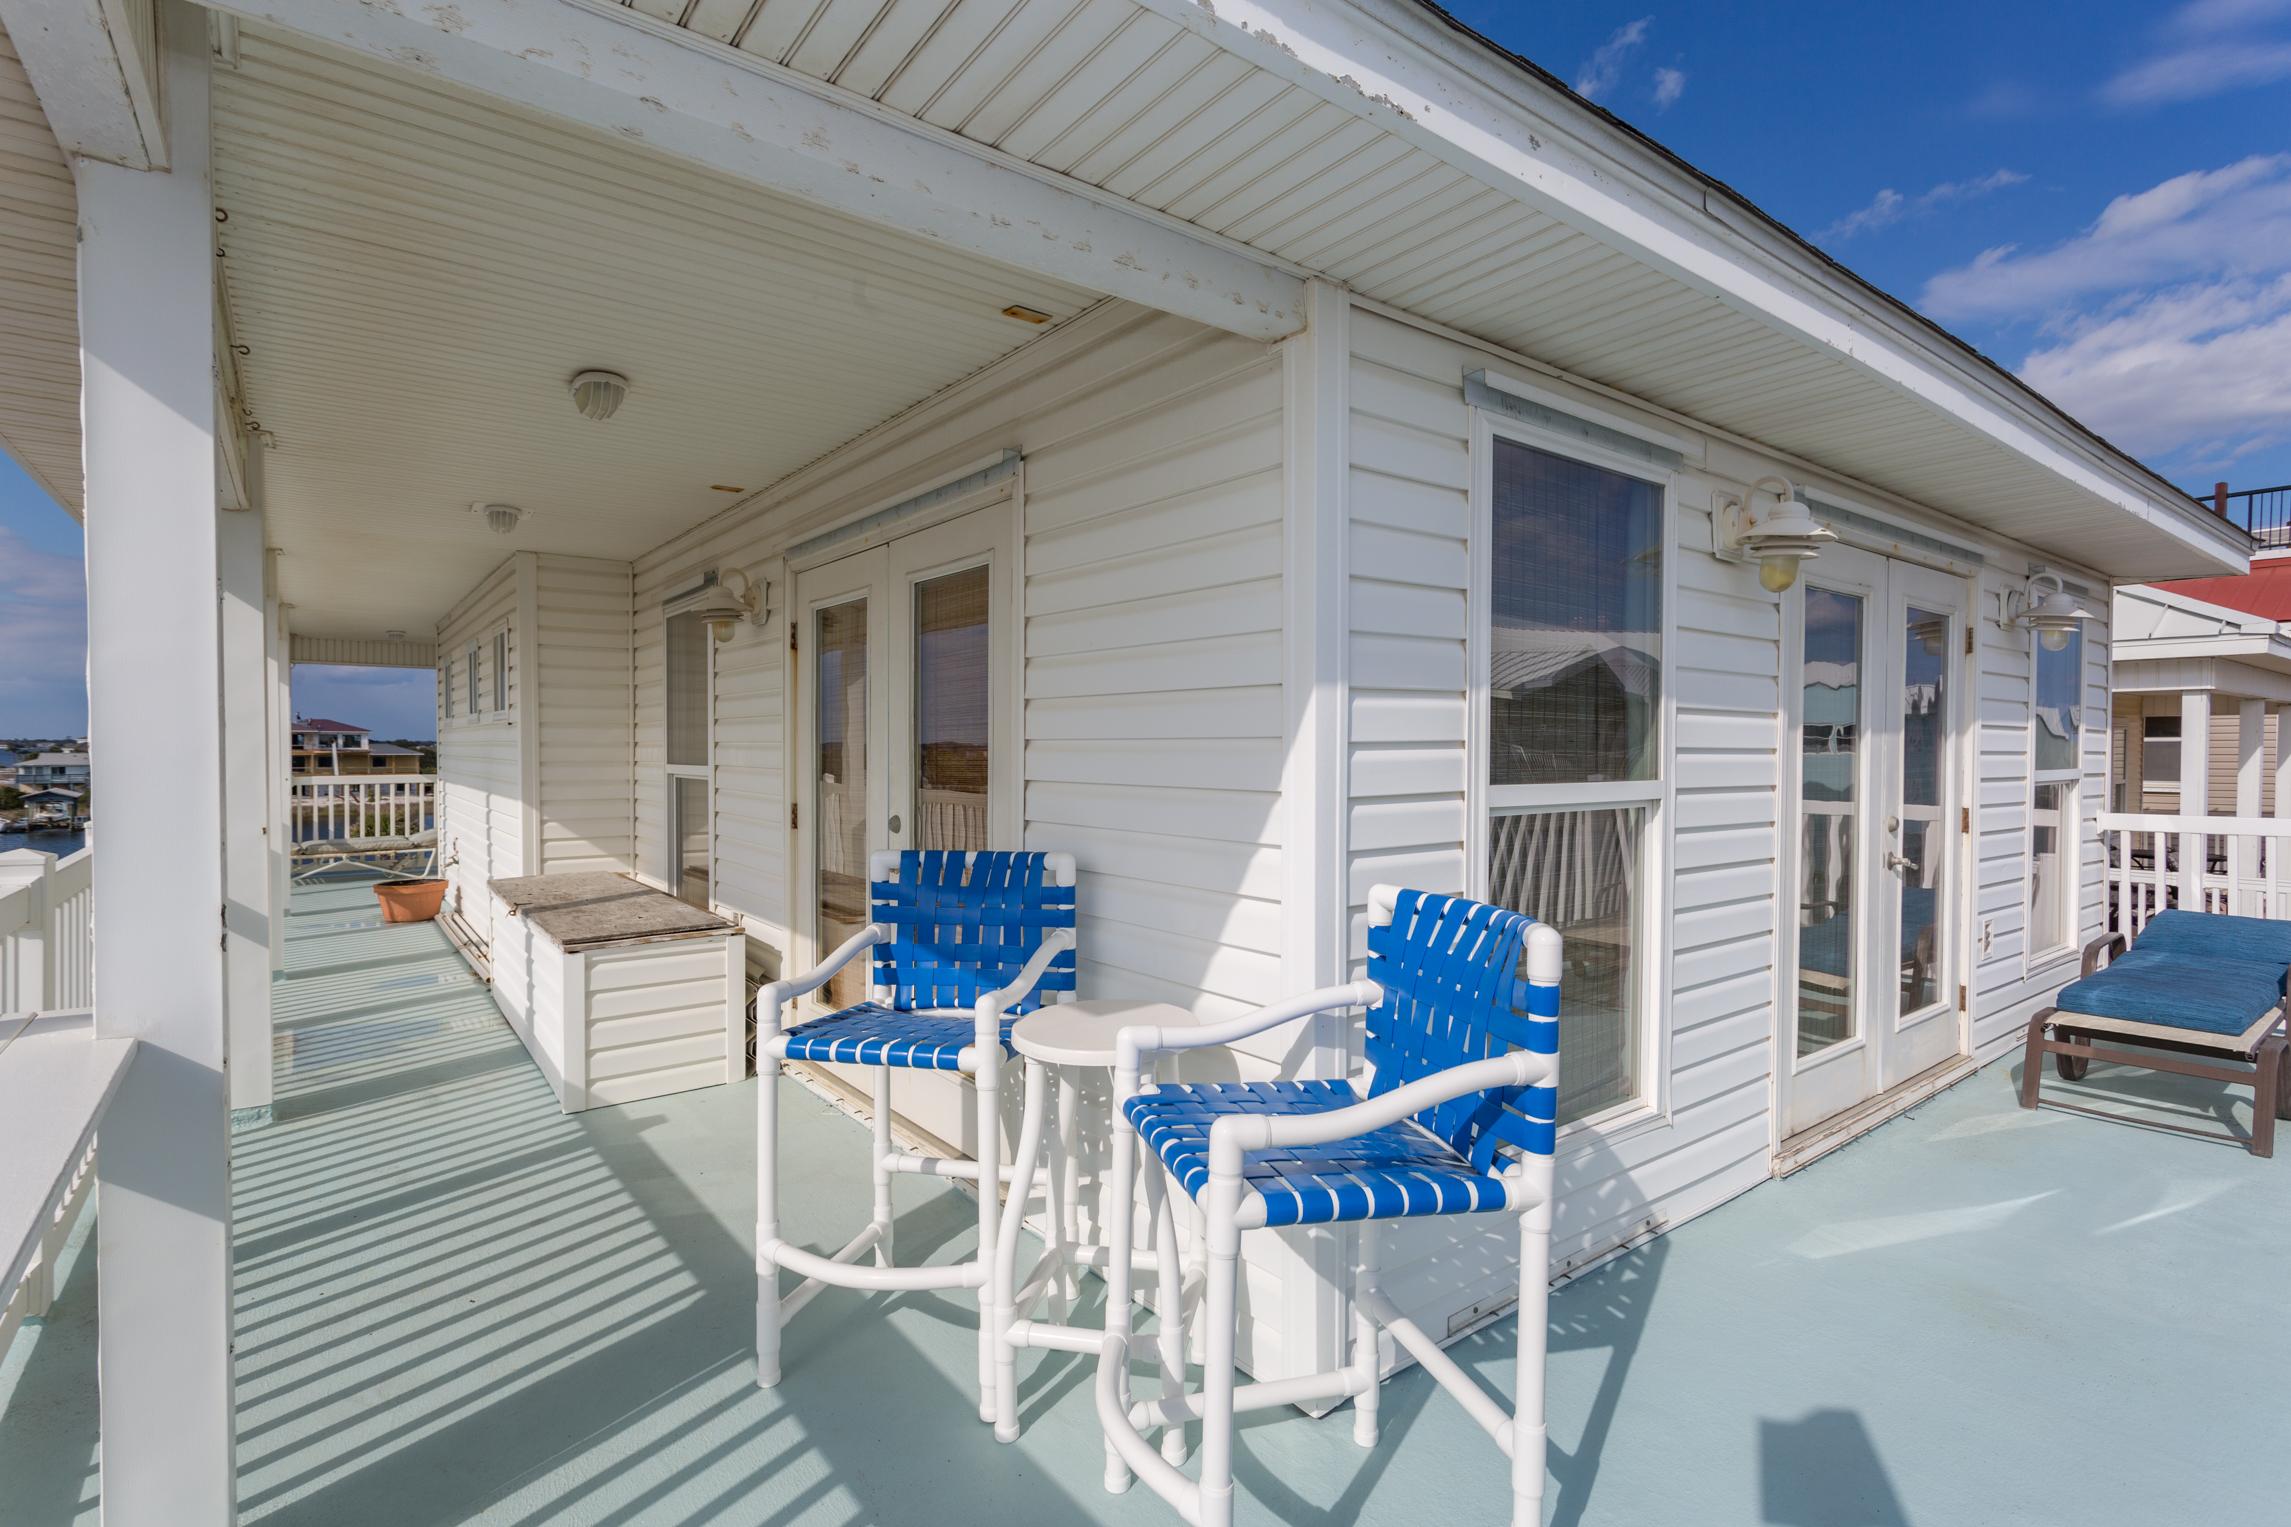 White Sands Cottage 501 Life's a Beach House Townhouse rental in White Sands Pensacola Beach in Pensacola Beach Florida - #34